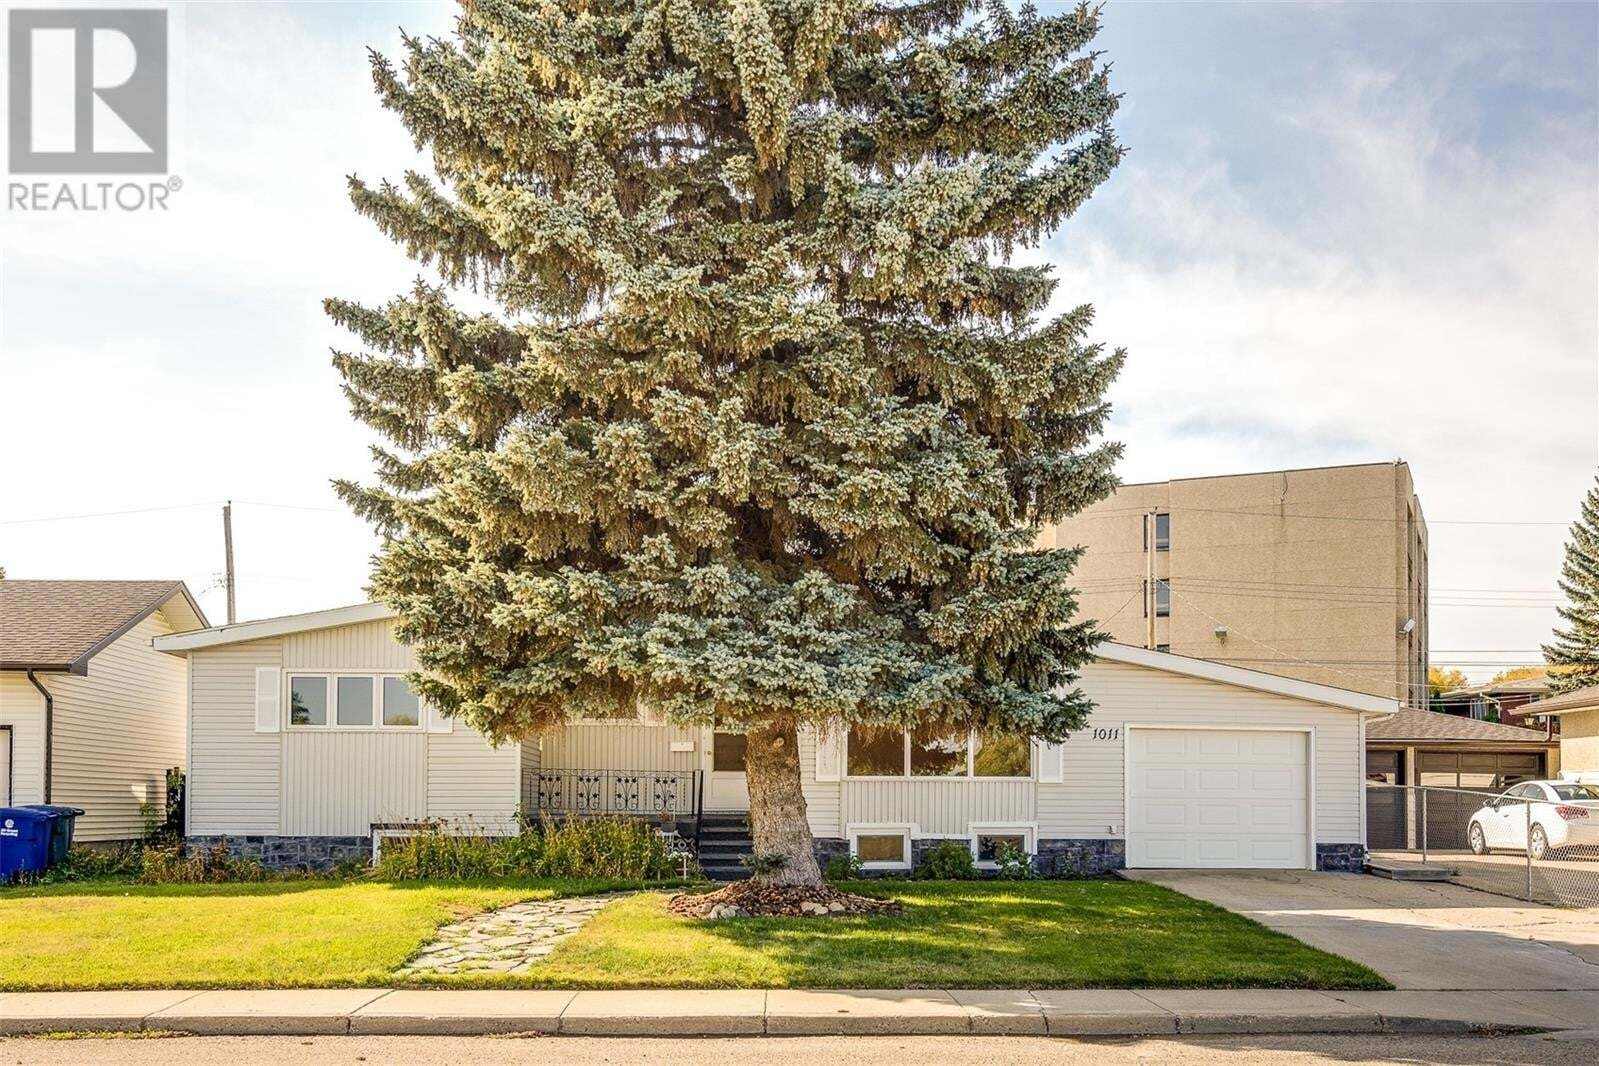 House for sale at 1011 Mcmillan Ave Saskatoon Saskatchewan - MLS: SK827650